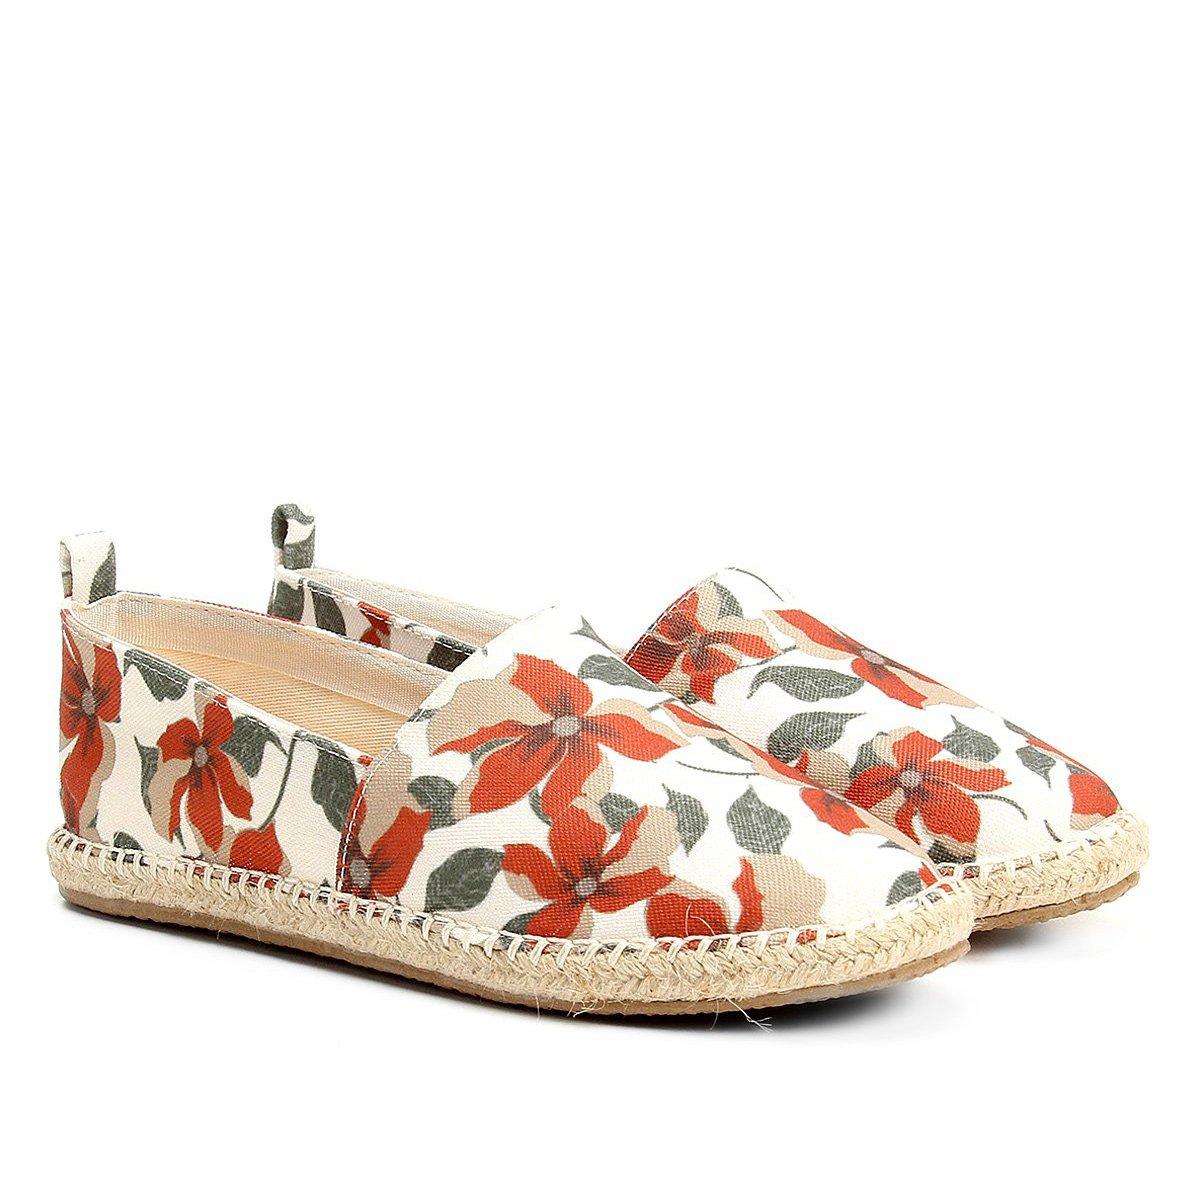 db8e639798 ... Sapatilha Shoestock Hibisco Feminina